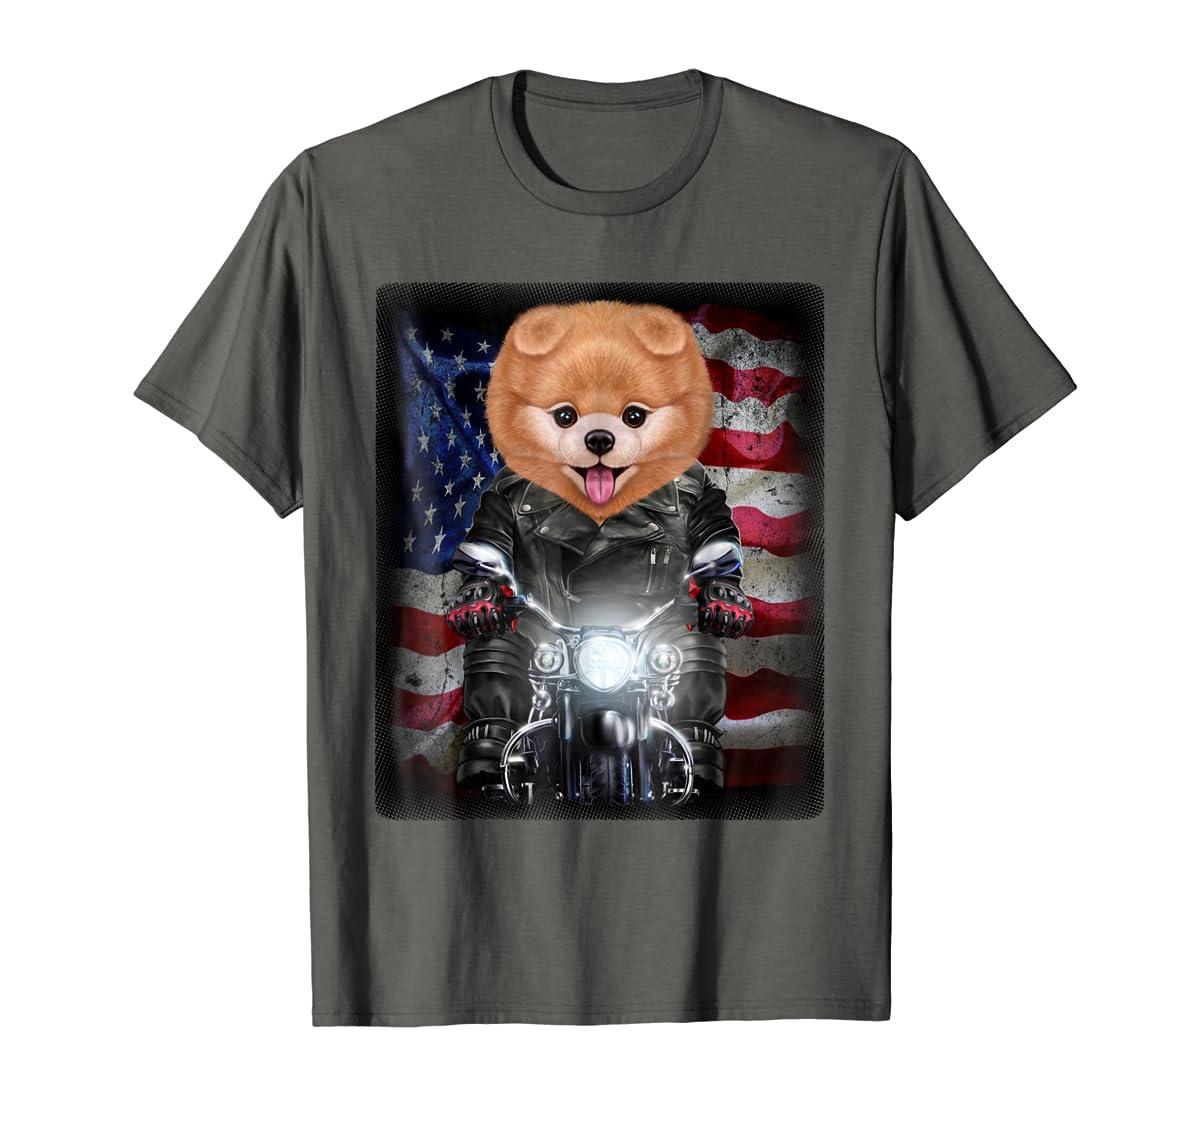 Pomeranian Dog on Motorbike with Flag of USA - T-Shirt-Men's T-Shirt-Dark Heather